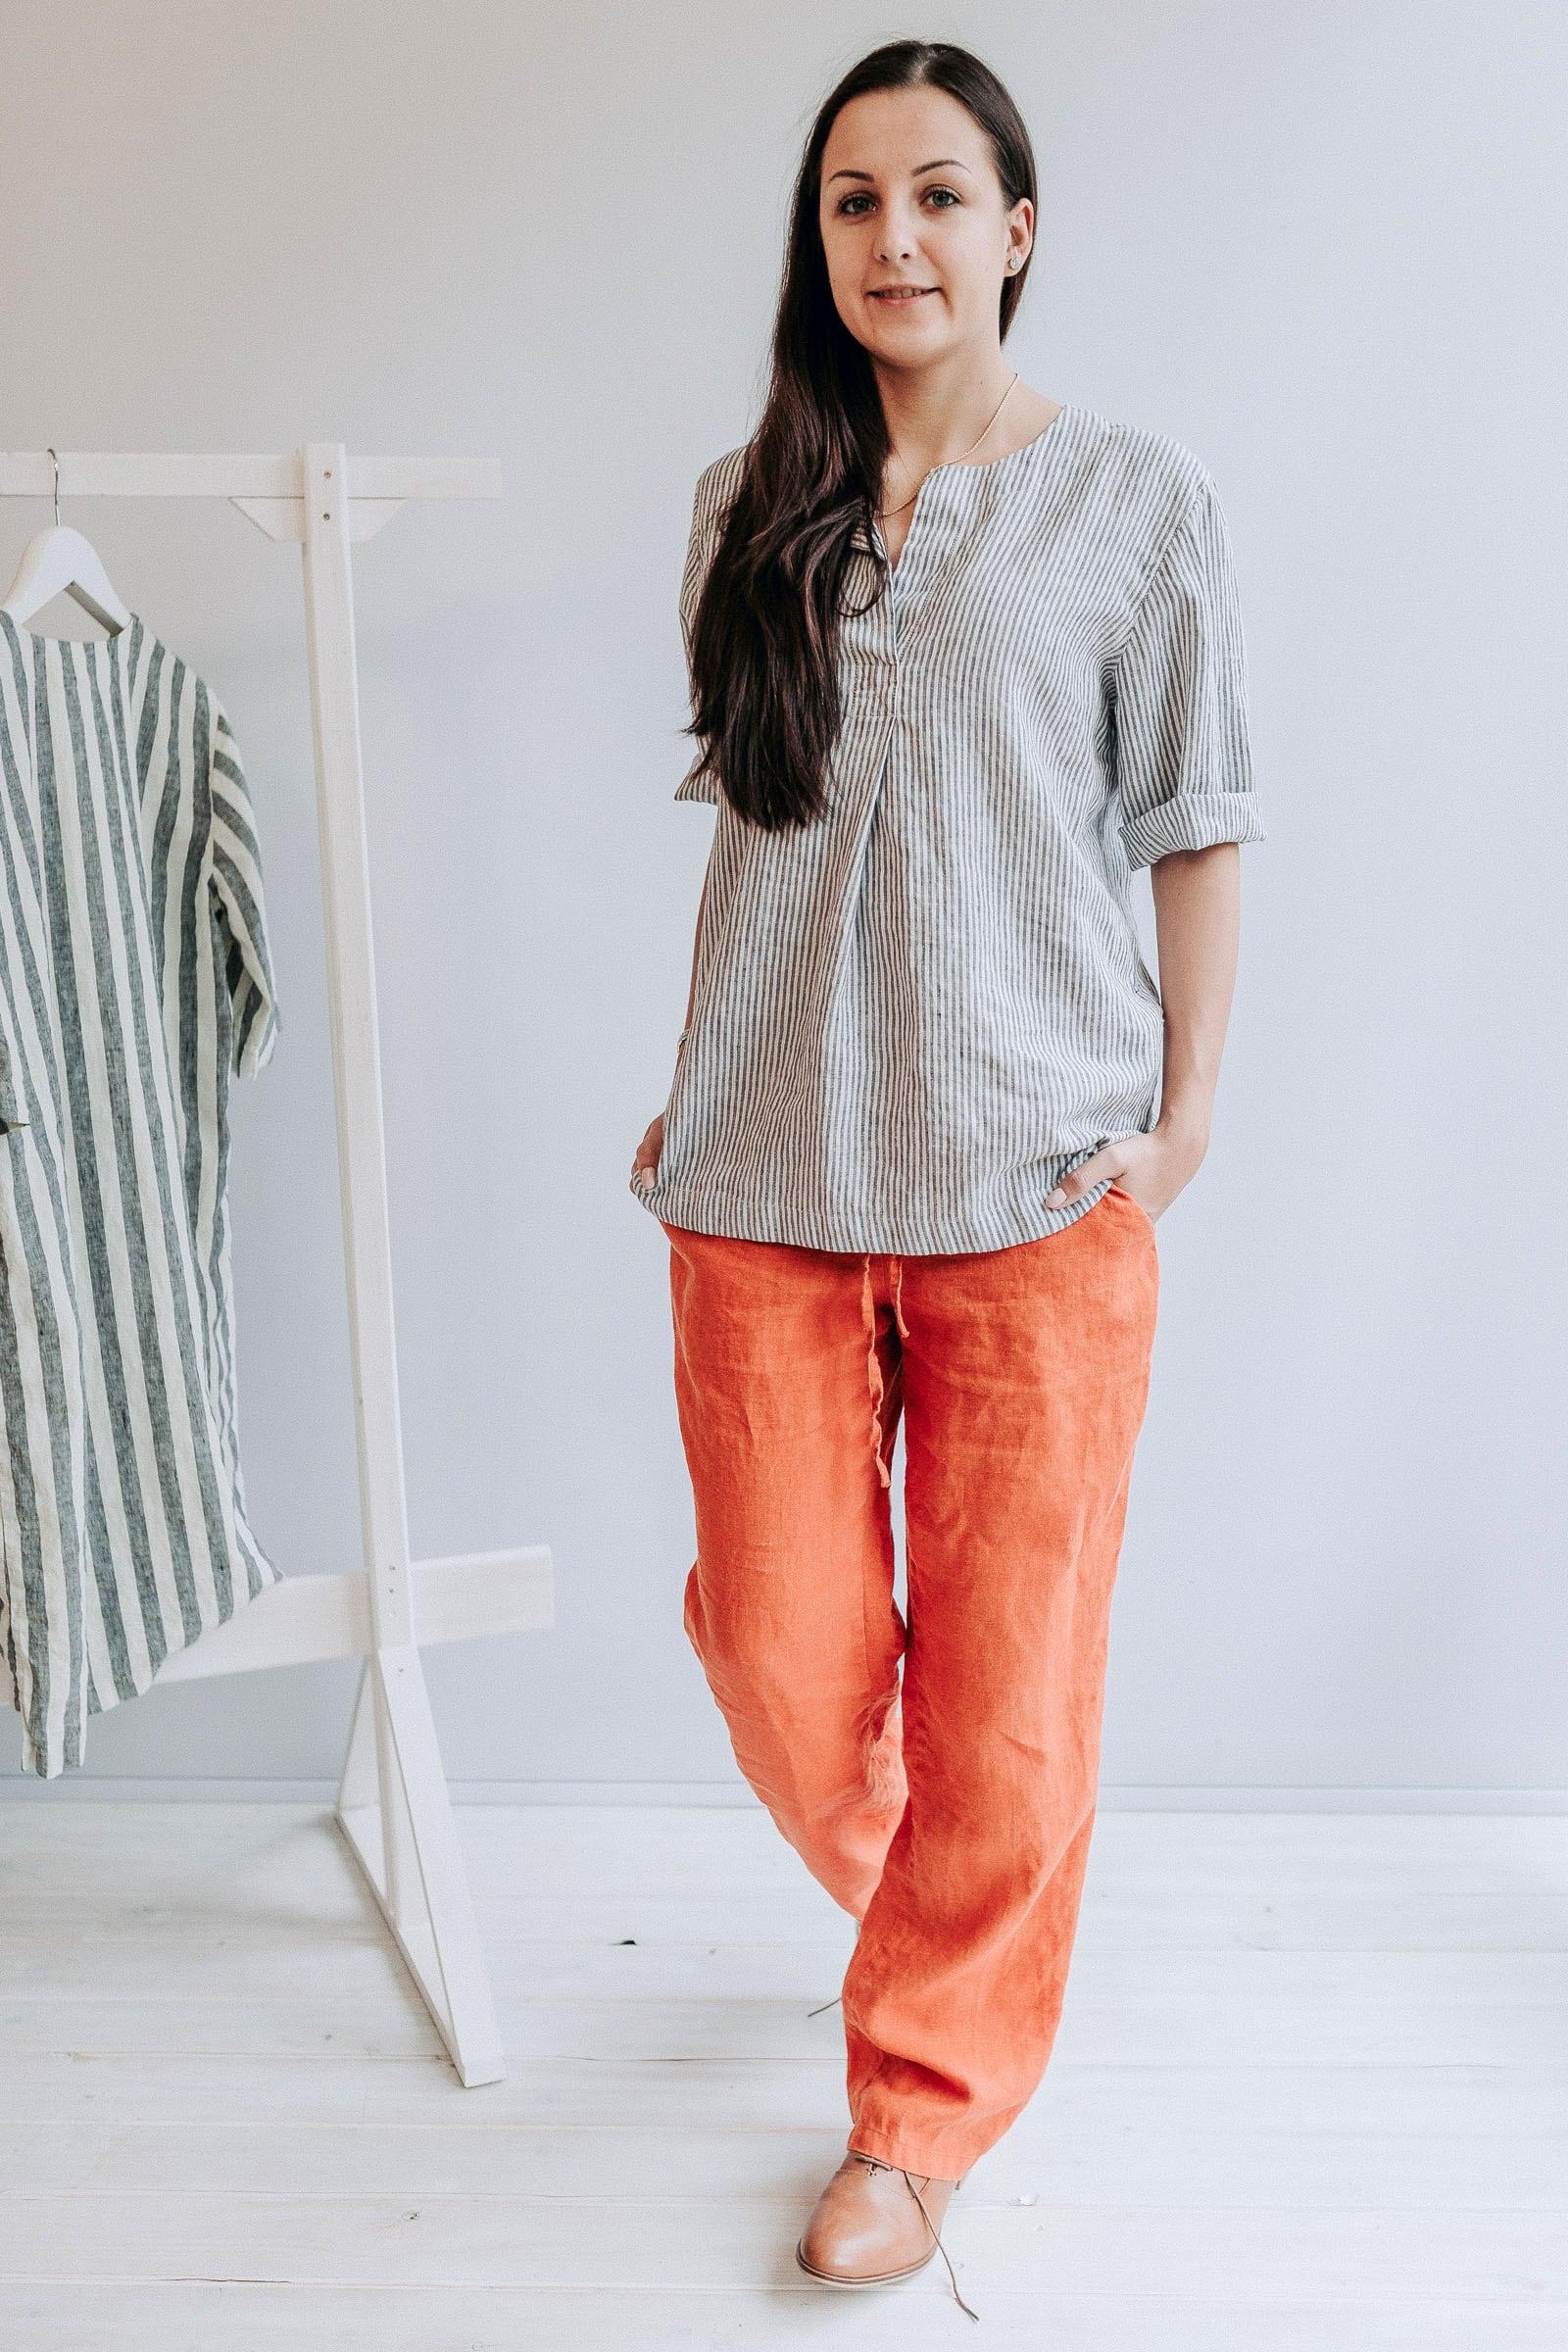 ac912d8a10d2 Womens Linen Shirts Plus Sizes   Saddha